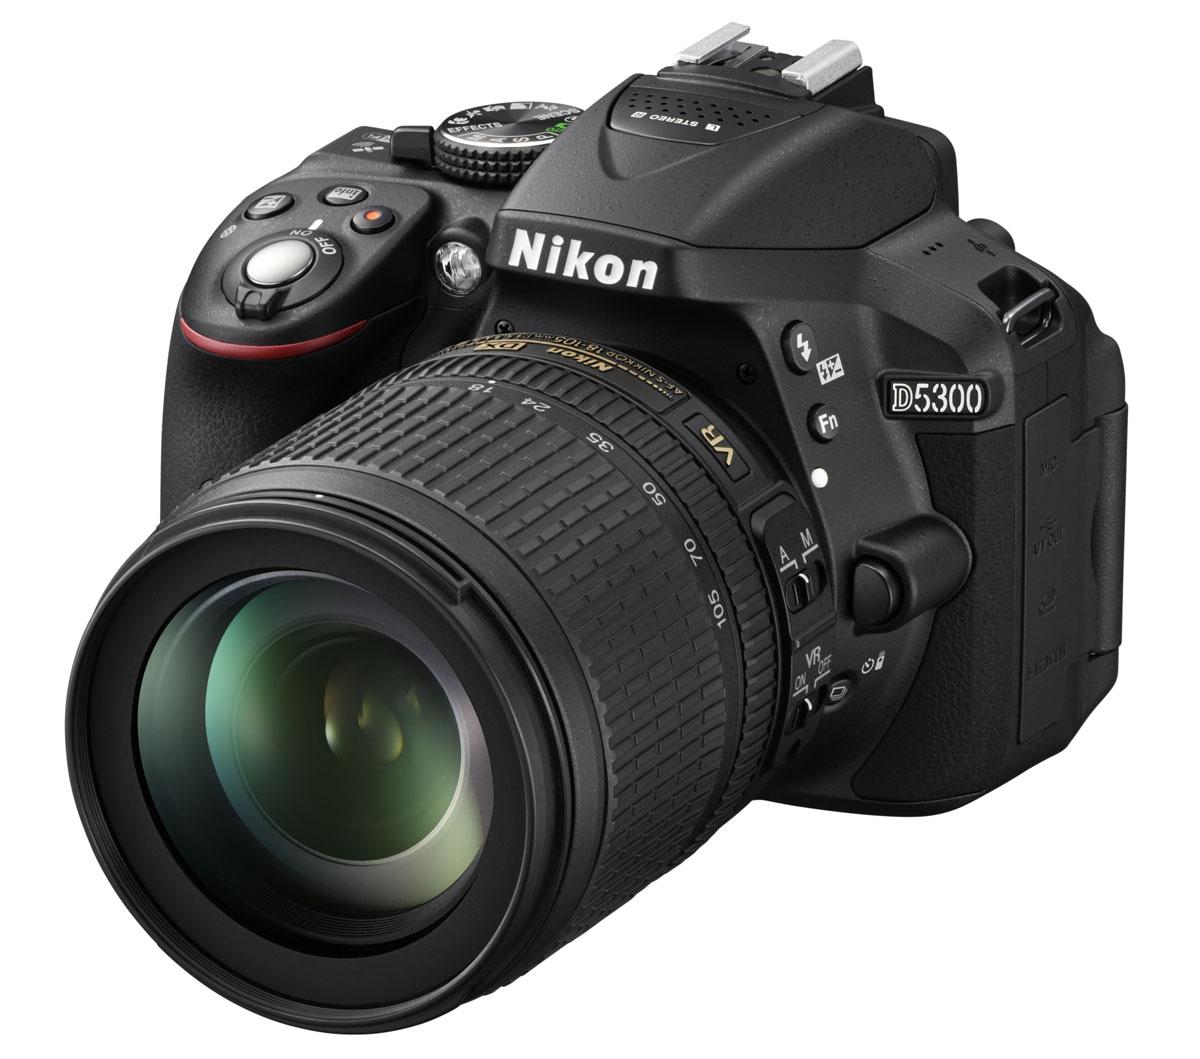 Nikon D5300 Kit 18-105 VR, Black цифровая зеркальная фотокамераVBA370K004